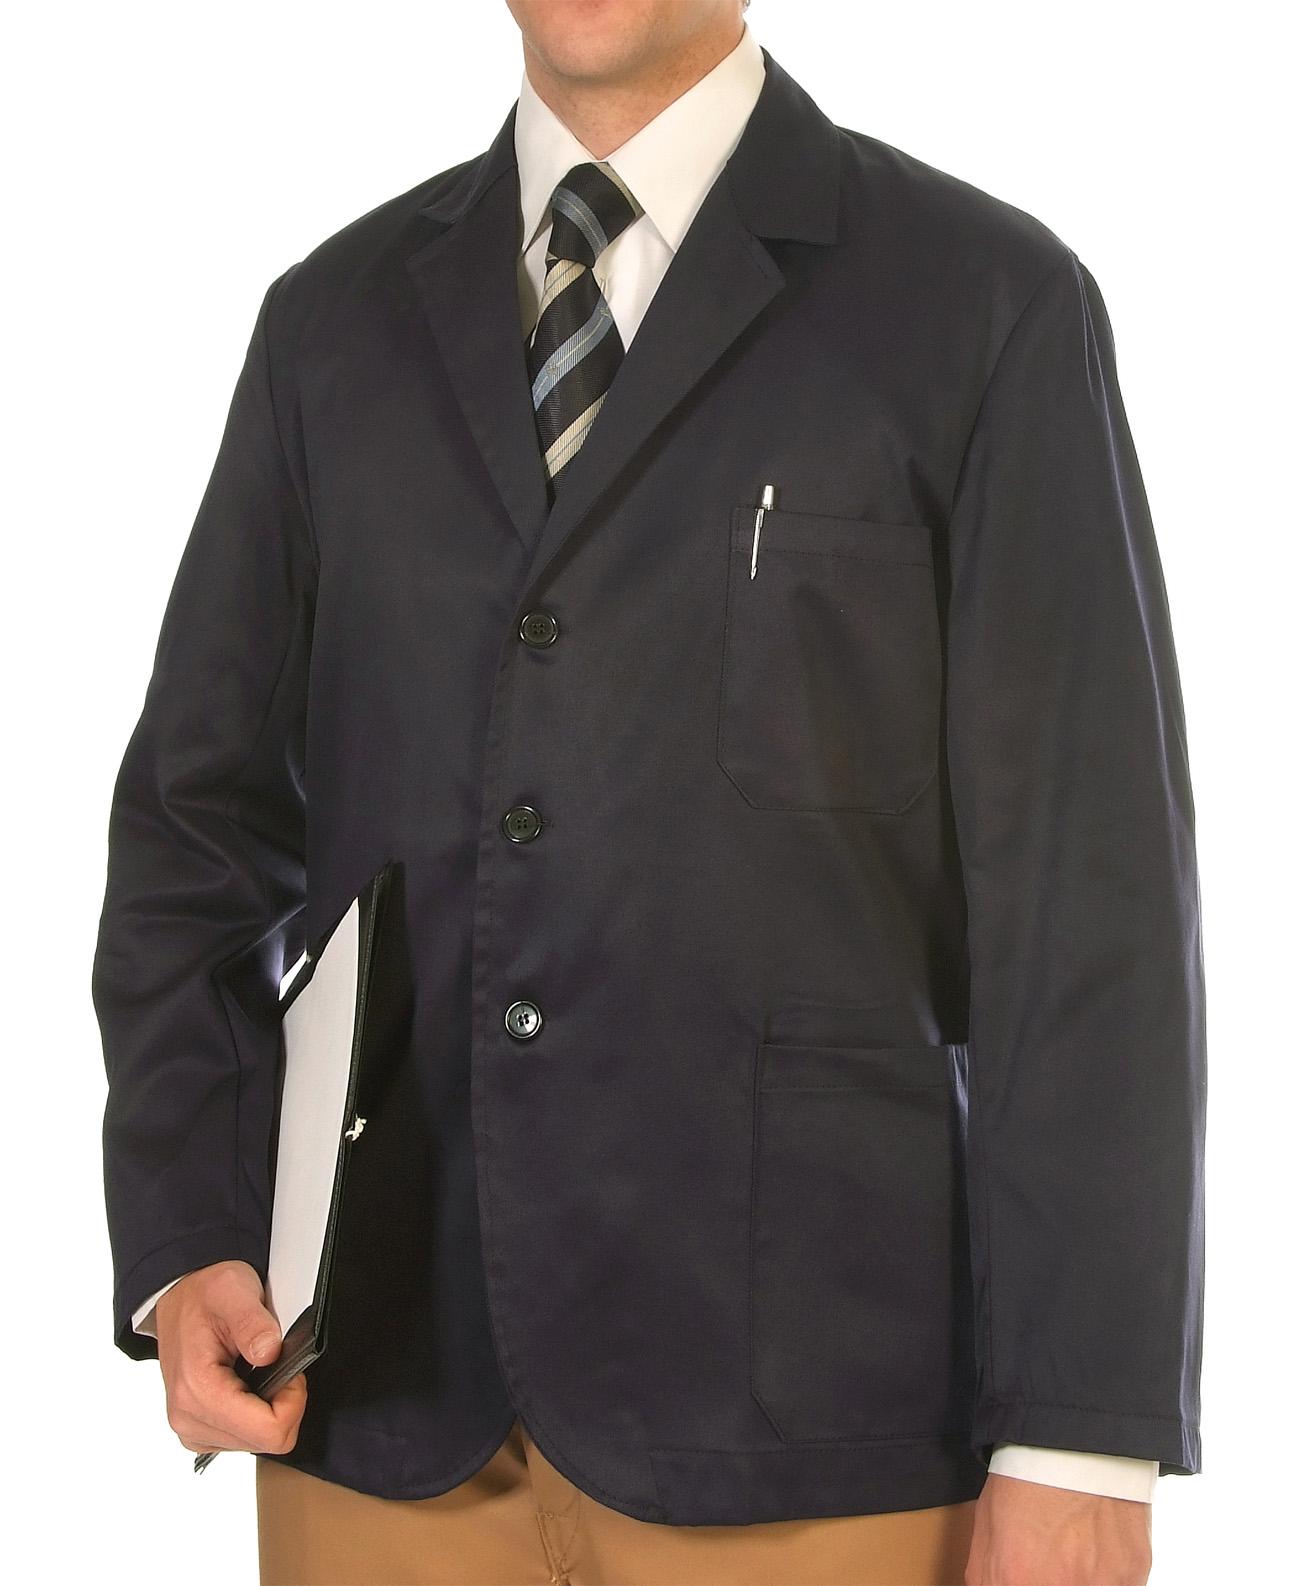 Jacket with lapels Image